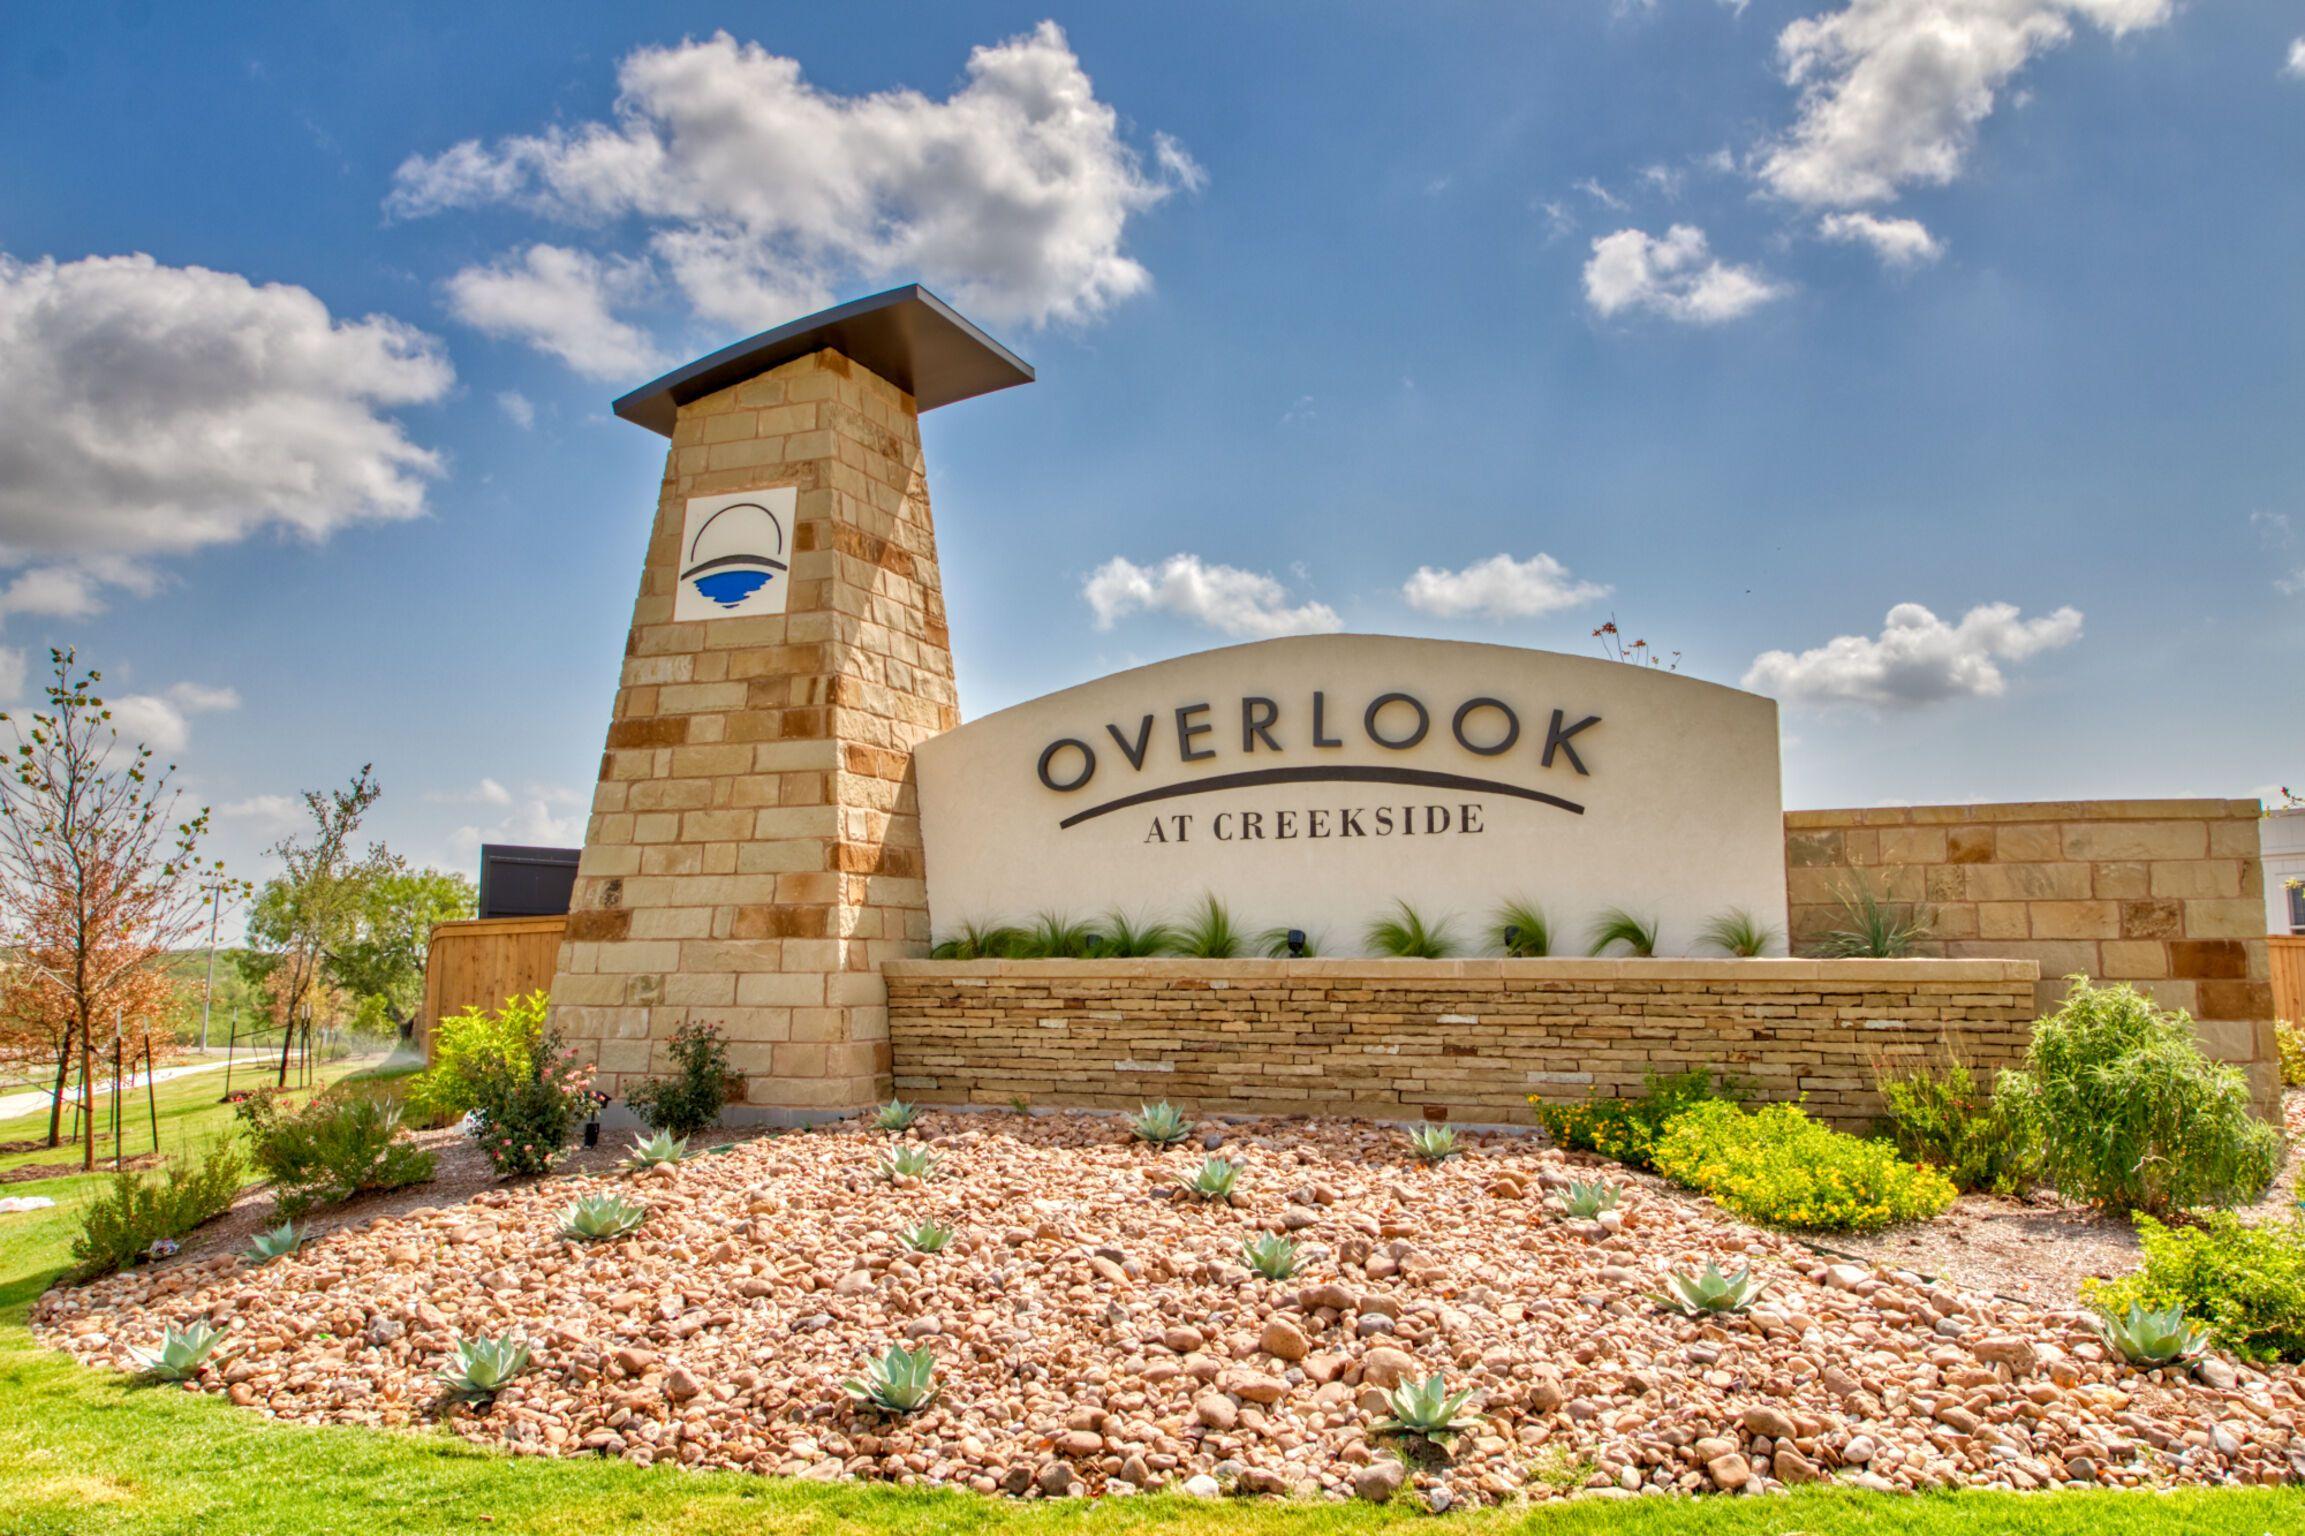 'Overlook At Creekside' by M/I Homes-San Antonio in San Antonio